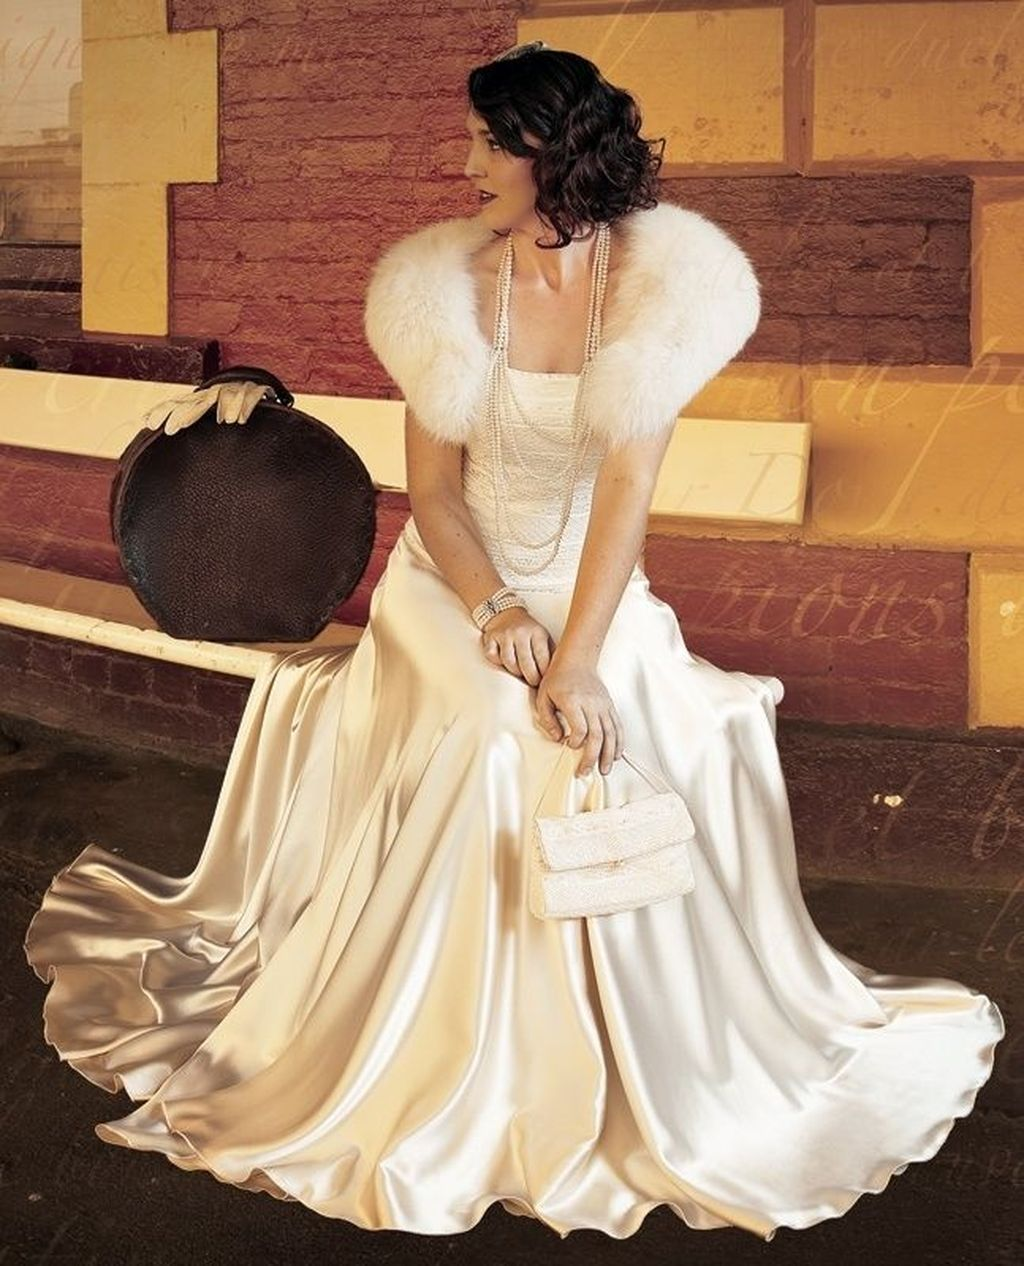 38 Fabulous Winter Wonderland Wedding Dresses Ideas Glamourous Wedding Dress Winter Wonderland Wedding Dress Hollywood Glamour Wedding